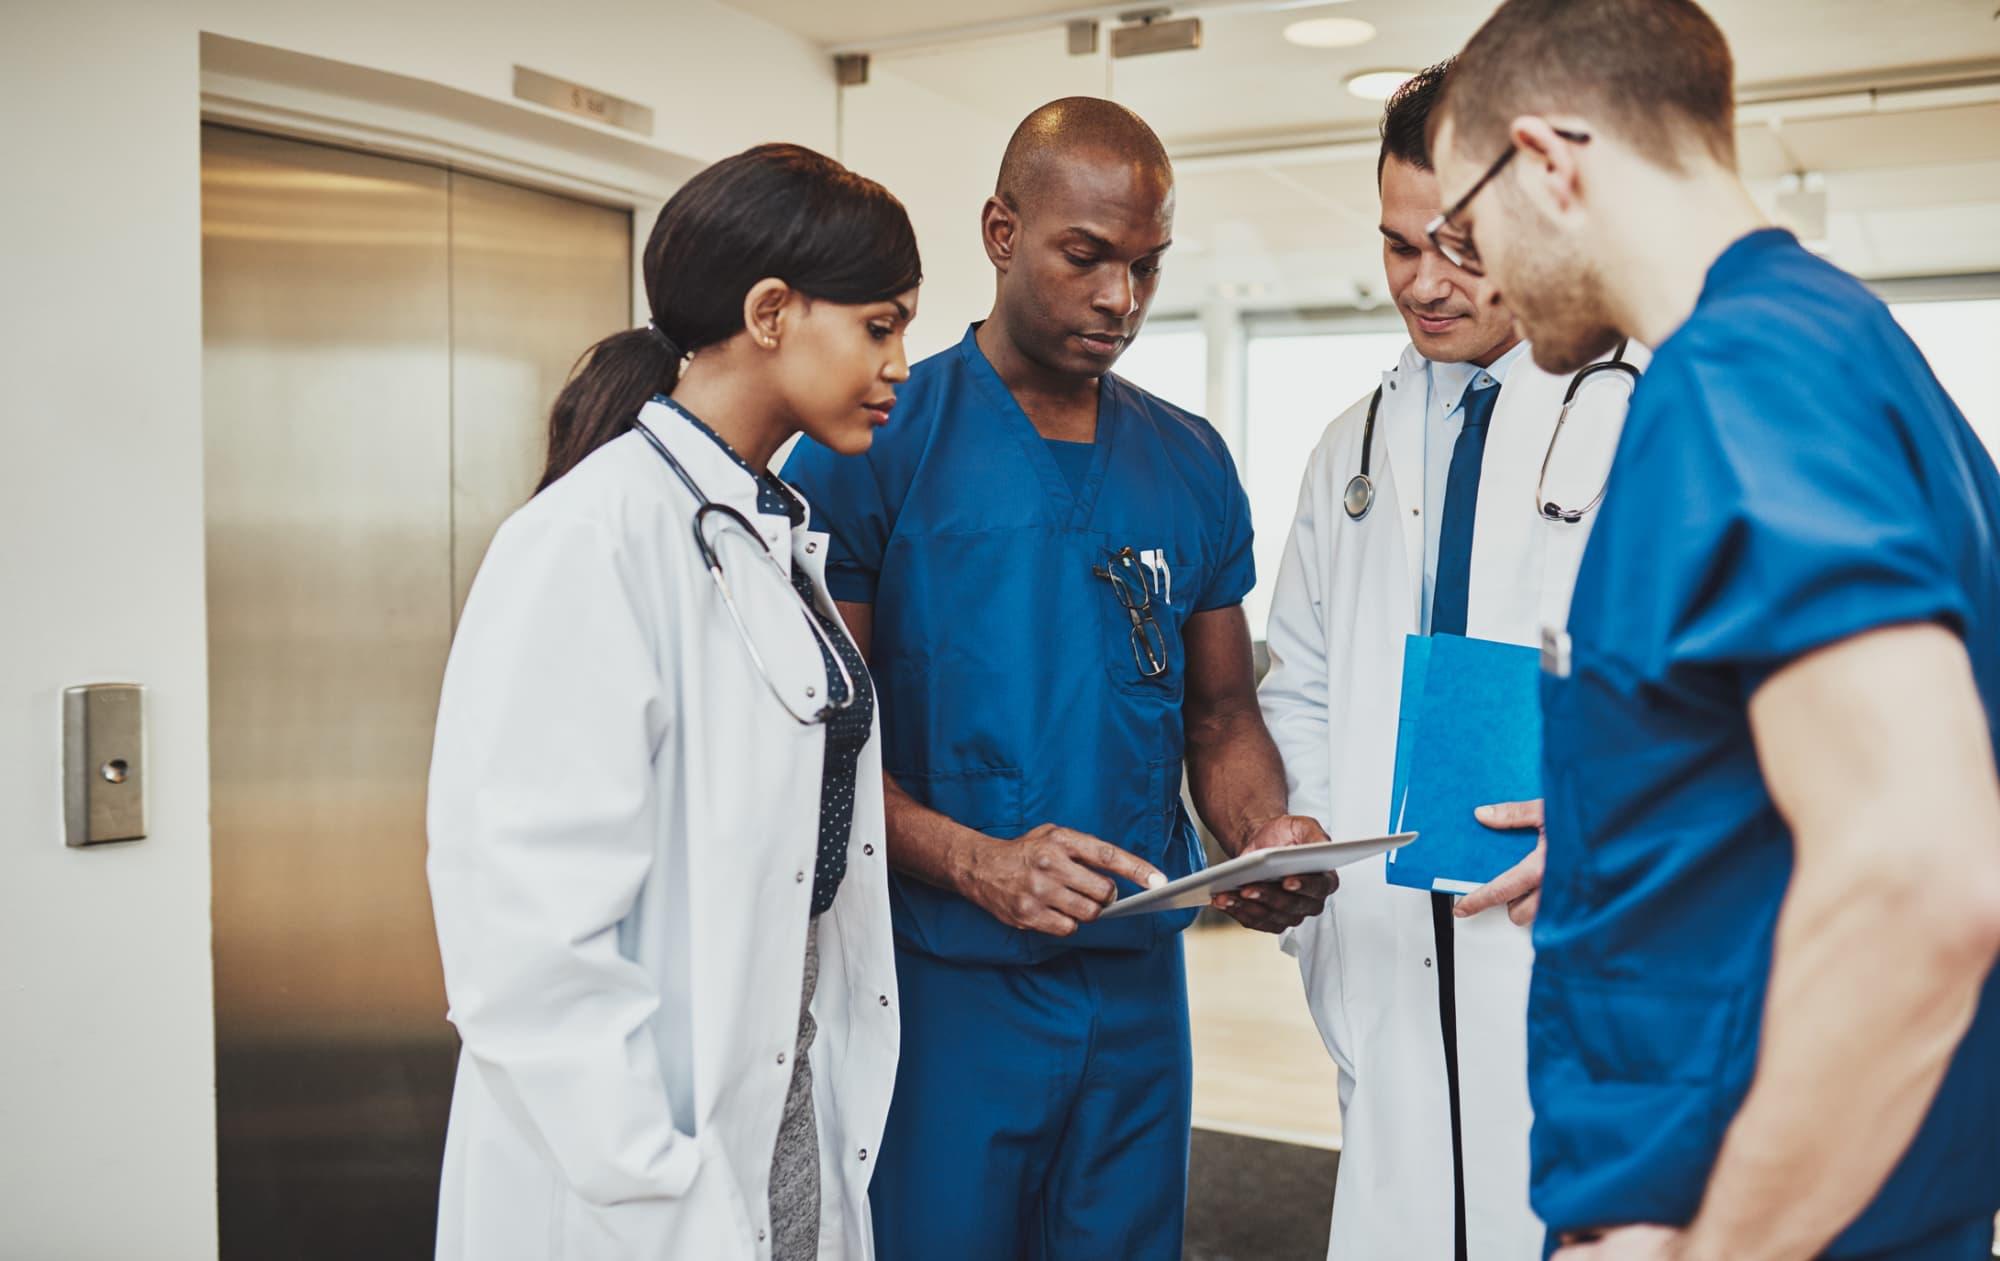 Clinical Nurse Leader Salary: How Much Can a CNL Expect to Earn?